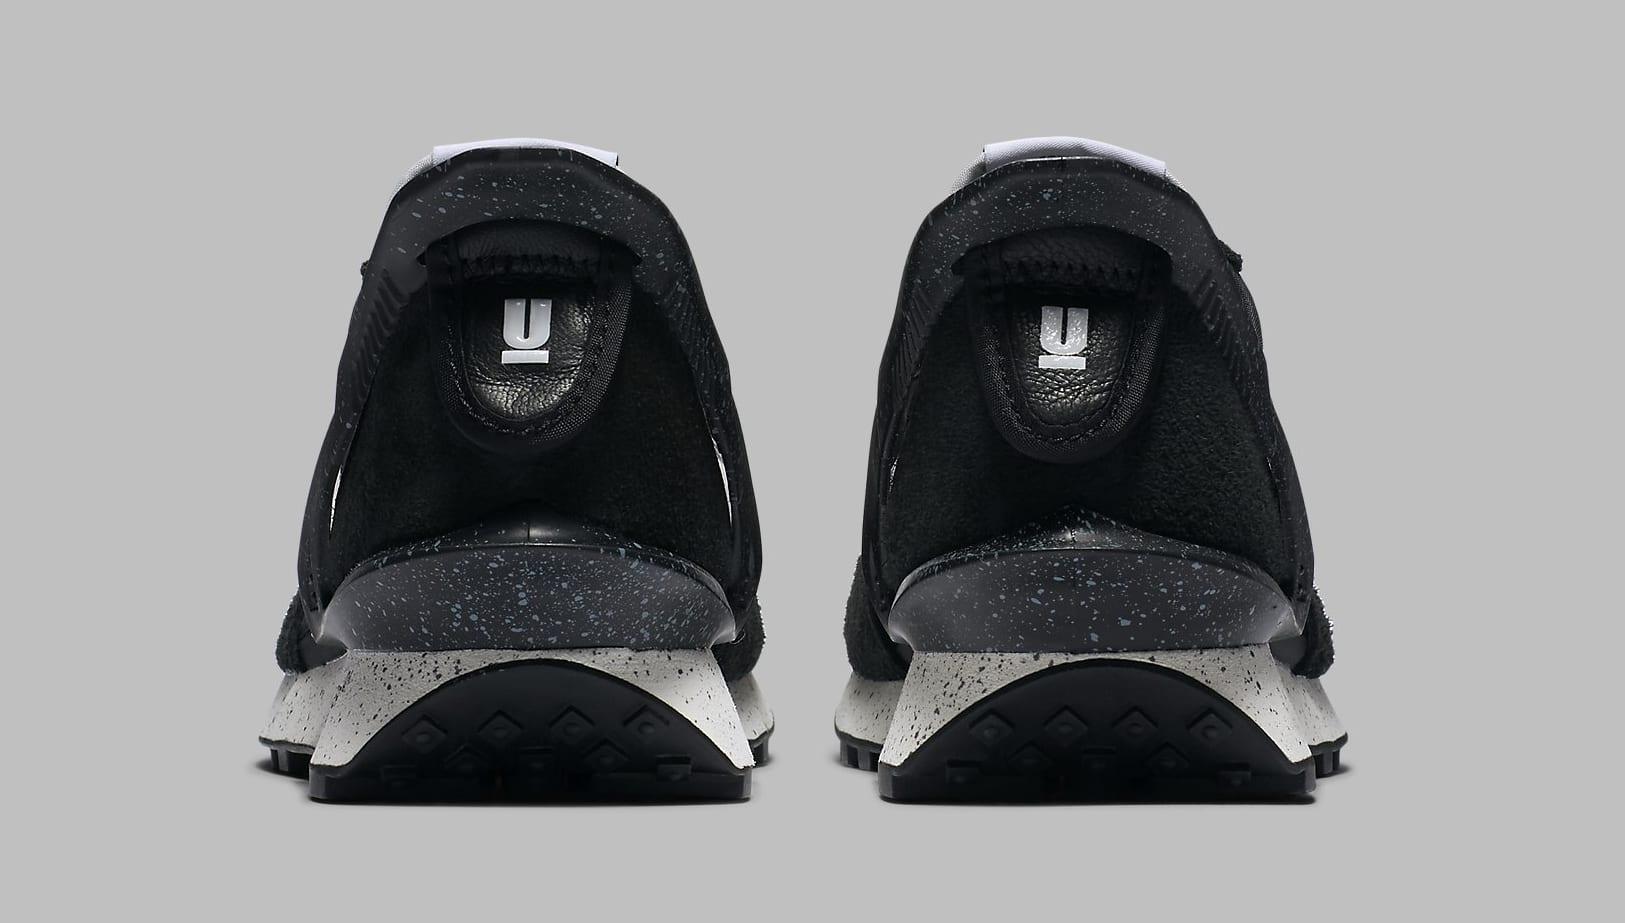 Undercover x Nike Daybreak 'Black' BV4594-001 Heel